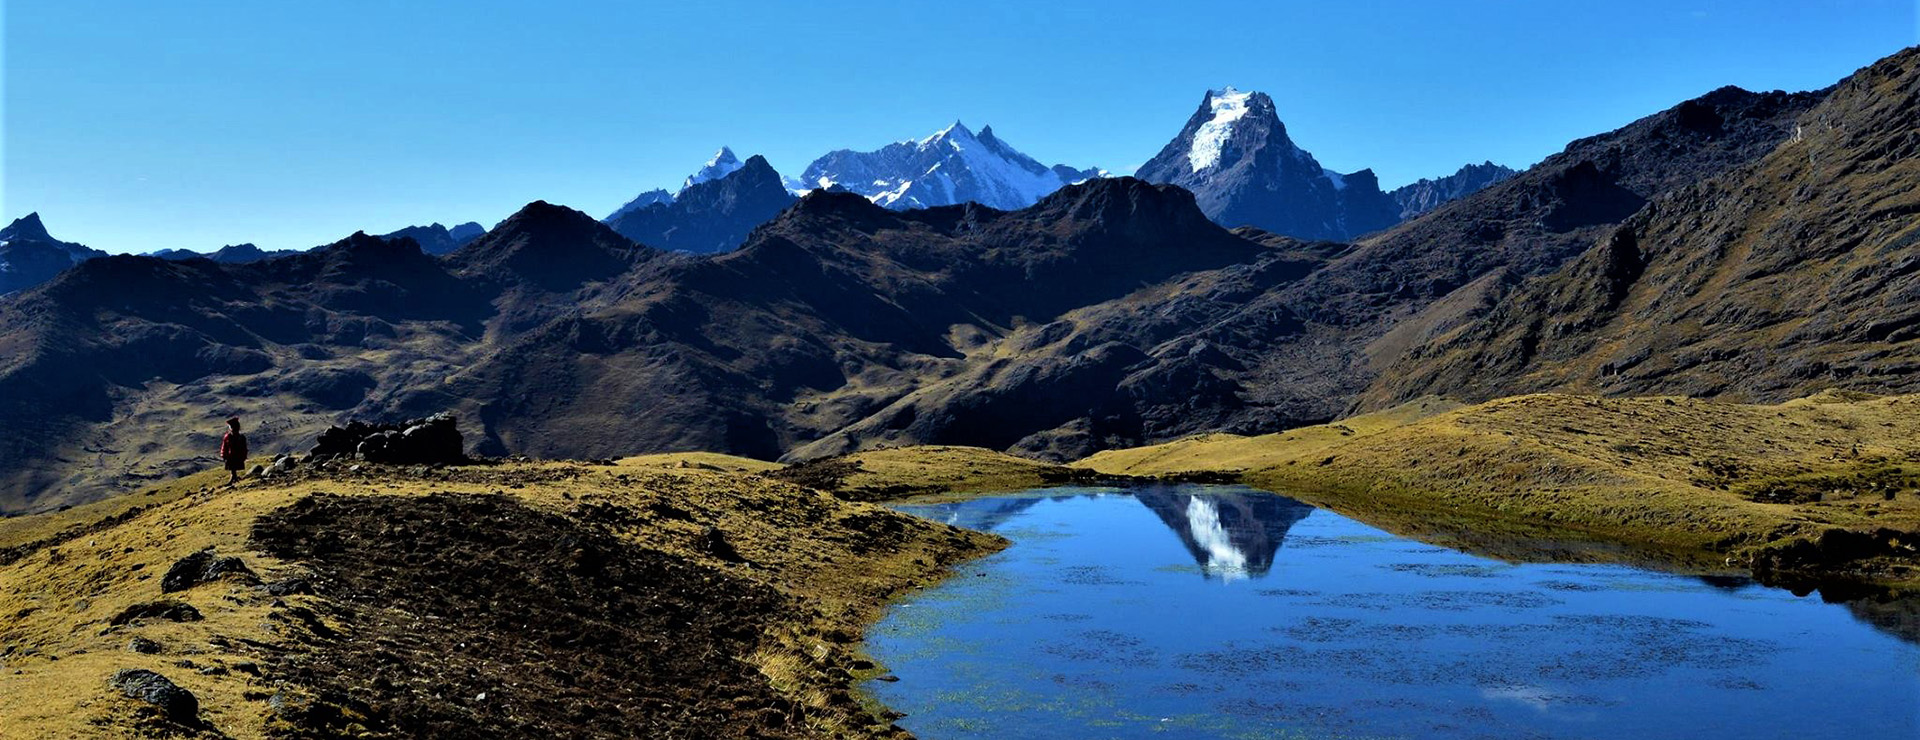 Excursions Peru